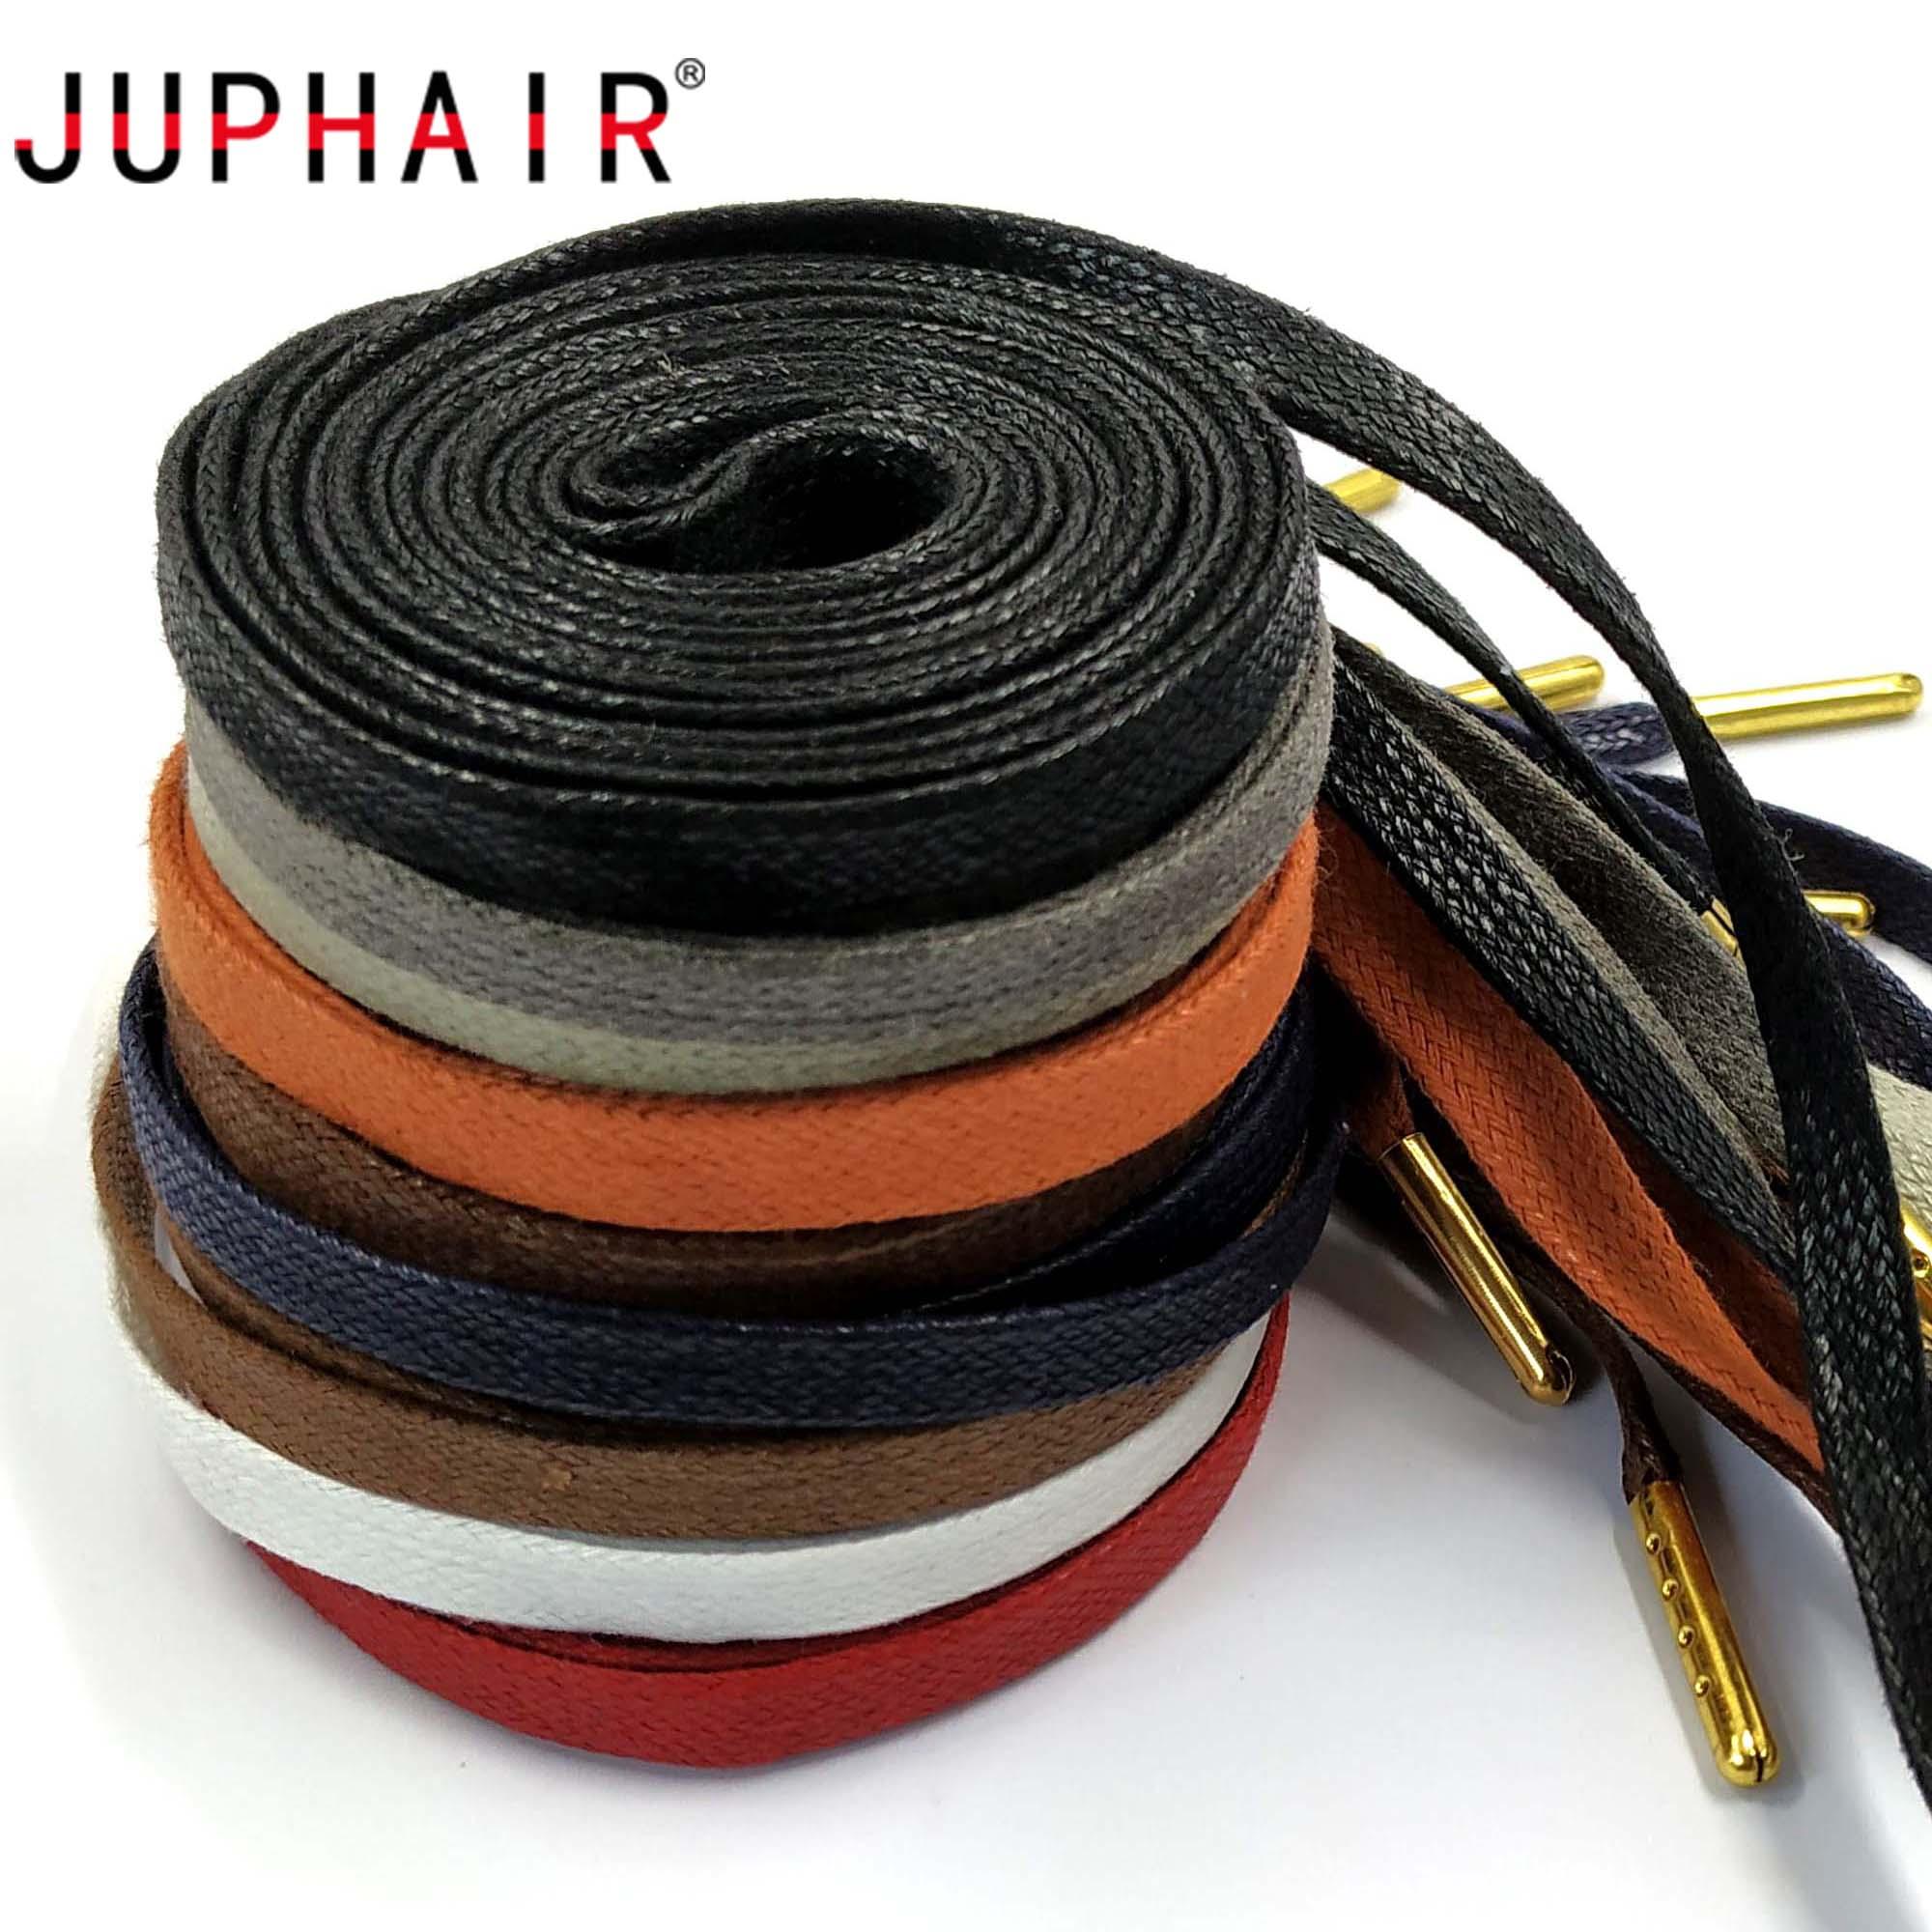 1 Pair Flat Waxed Cotton Shoelaces with Gold Metal Tip Unisex Leather Dress Wax Shoe Laces High Quality 70cm 90cm 120cm 150cm